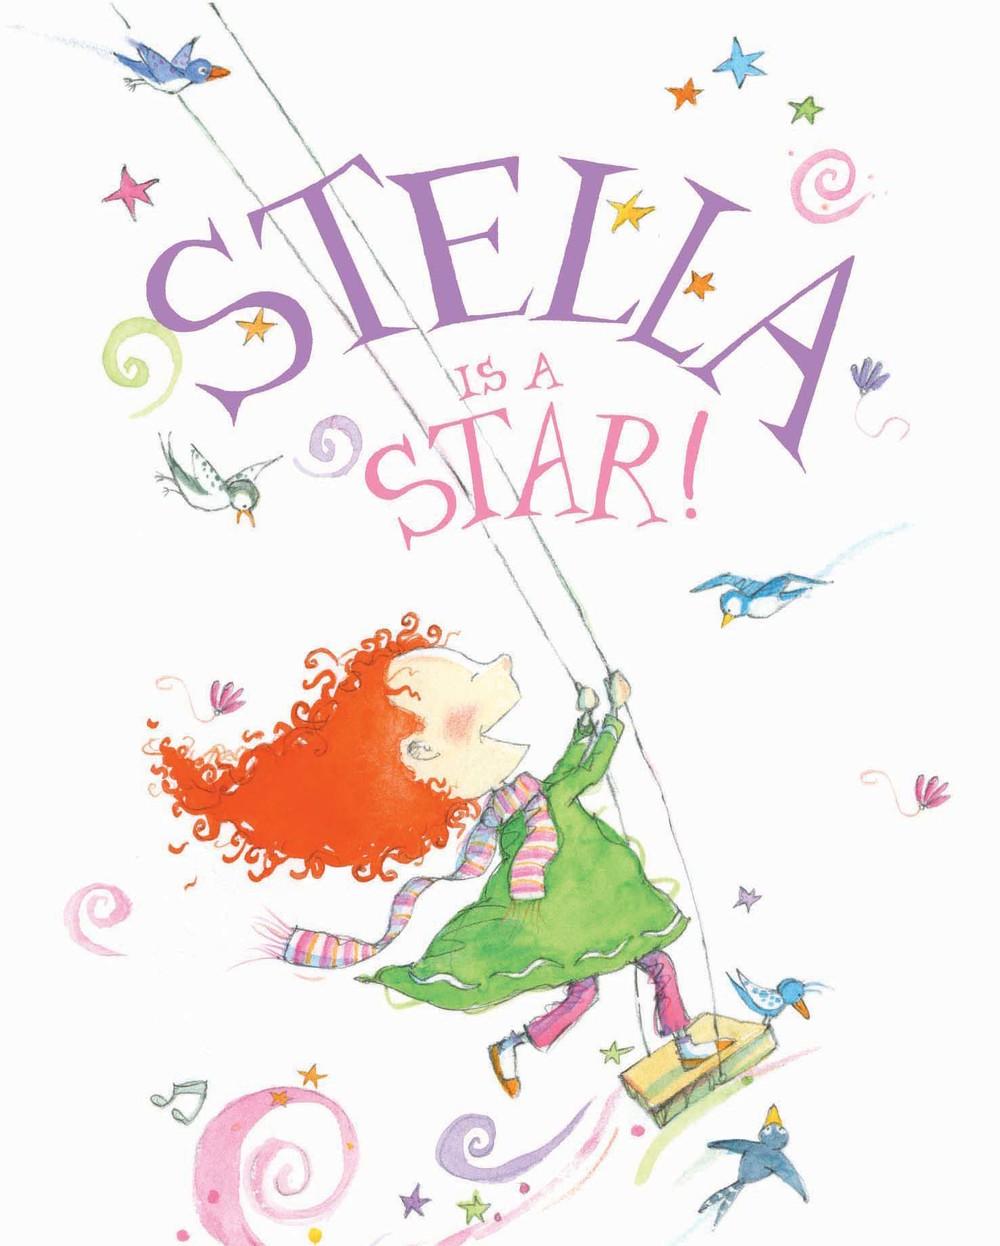 StellaStar#1